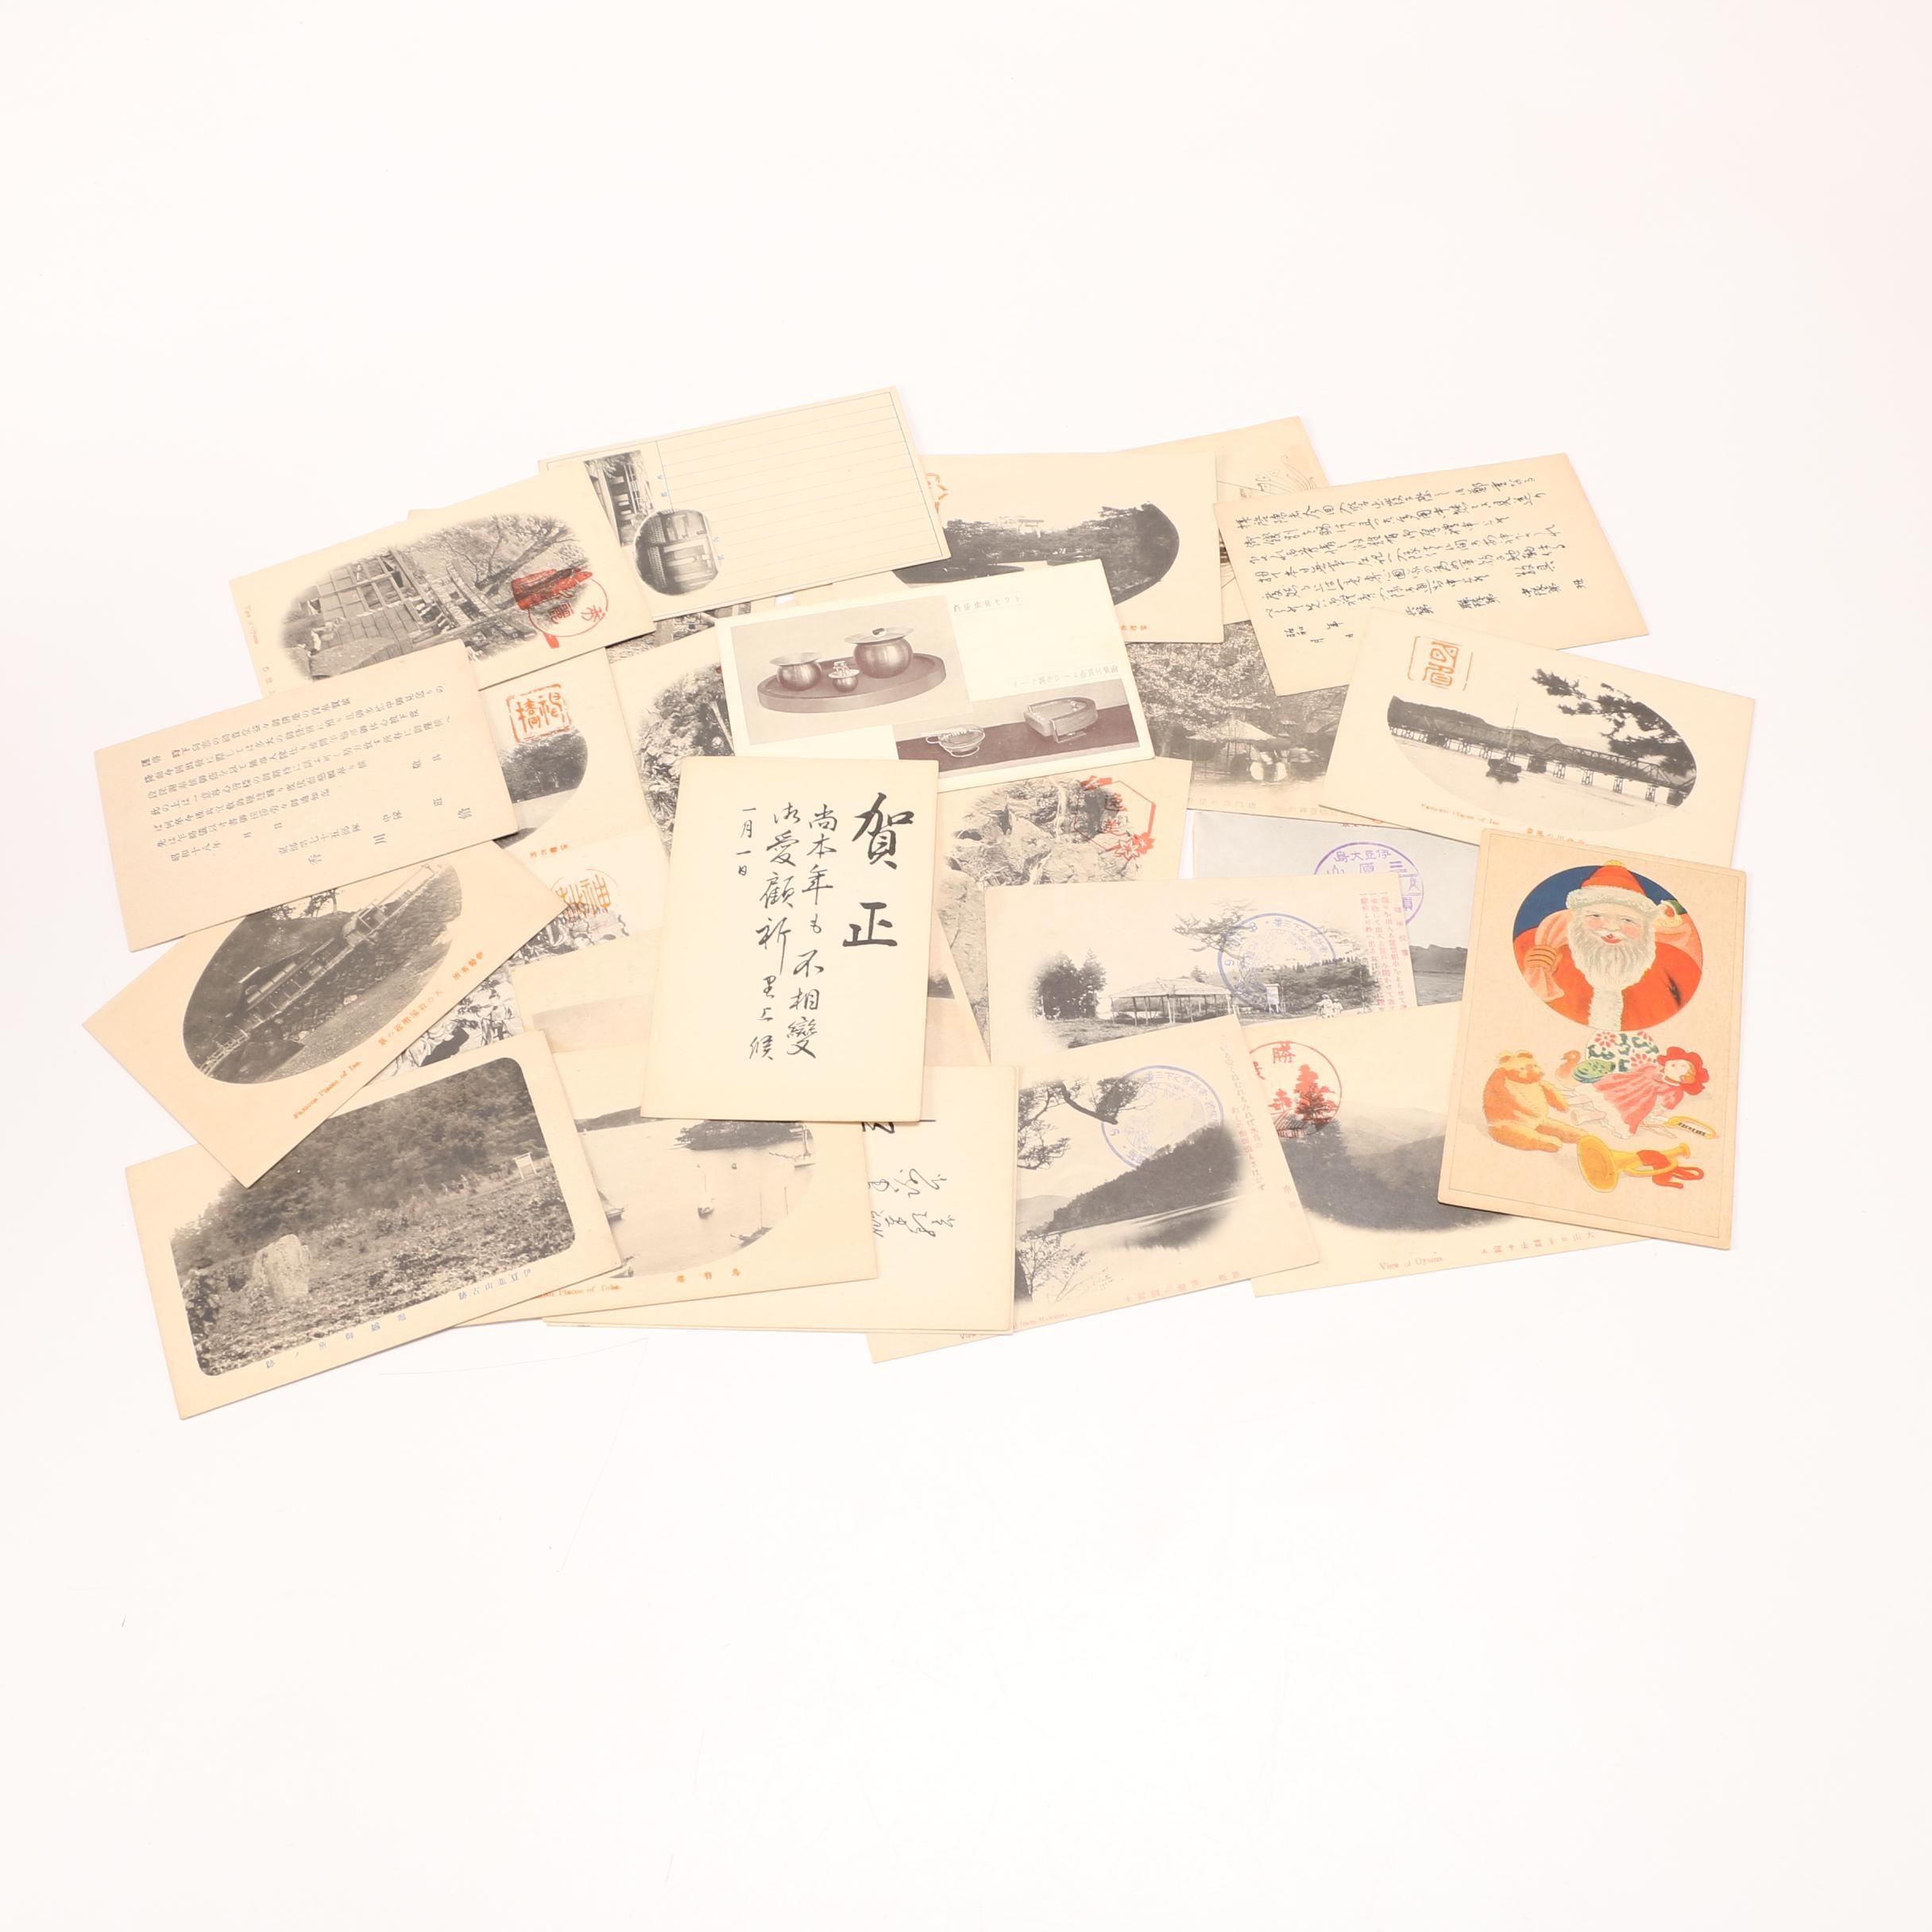 Circa 1940 Japanese Postcards